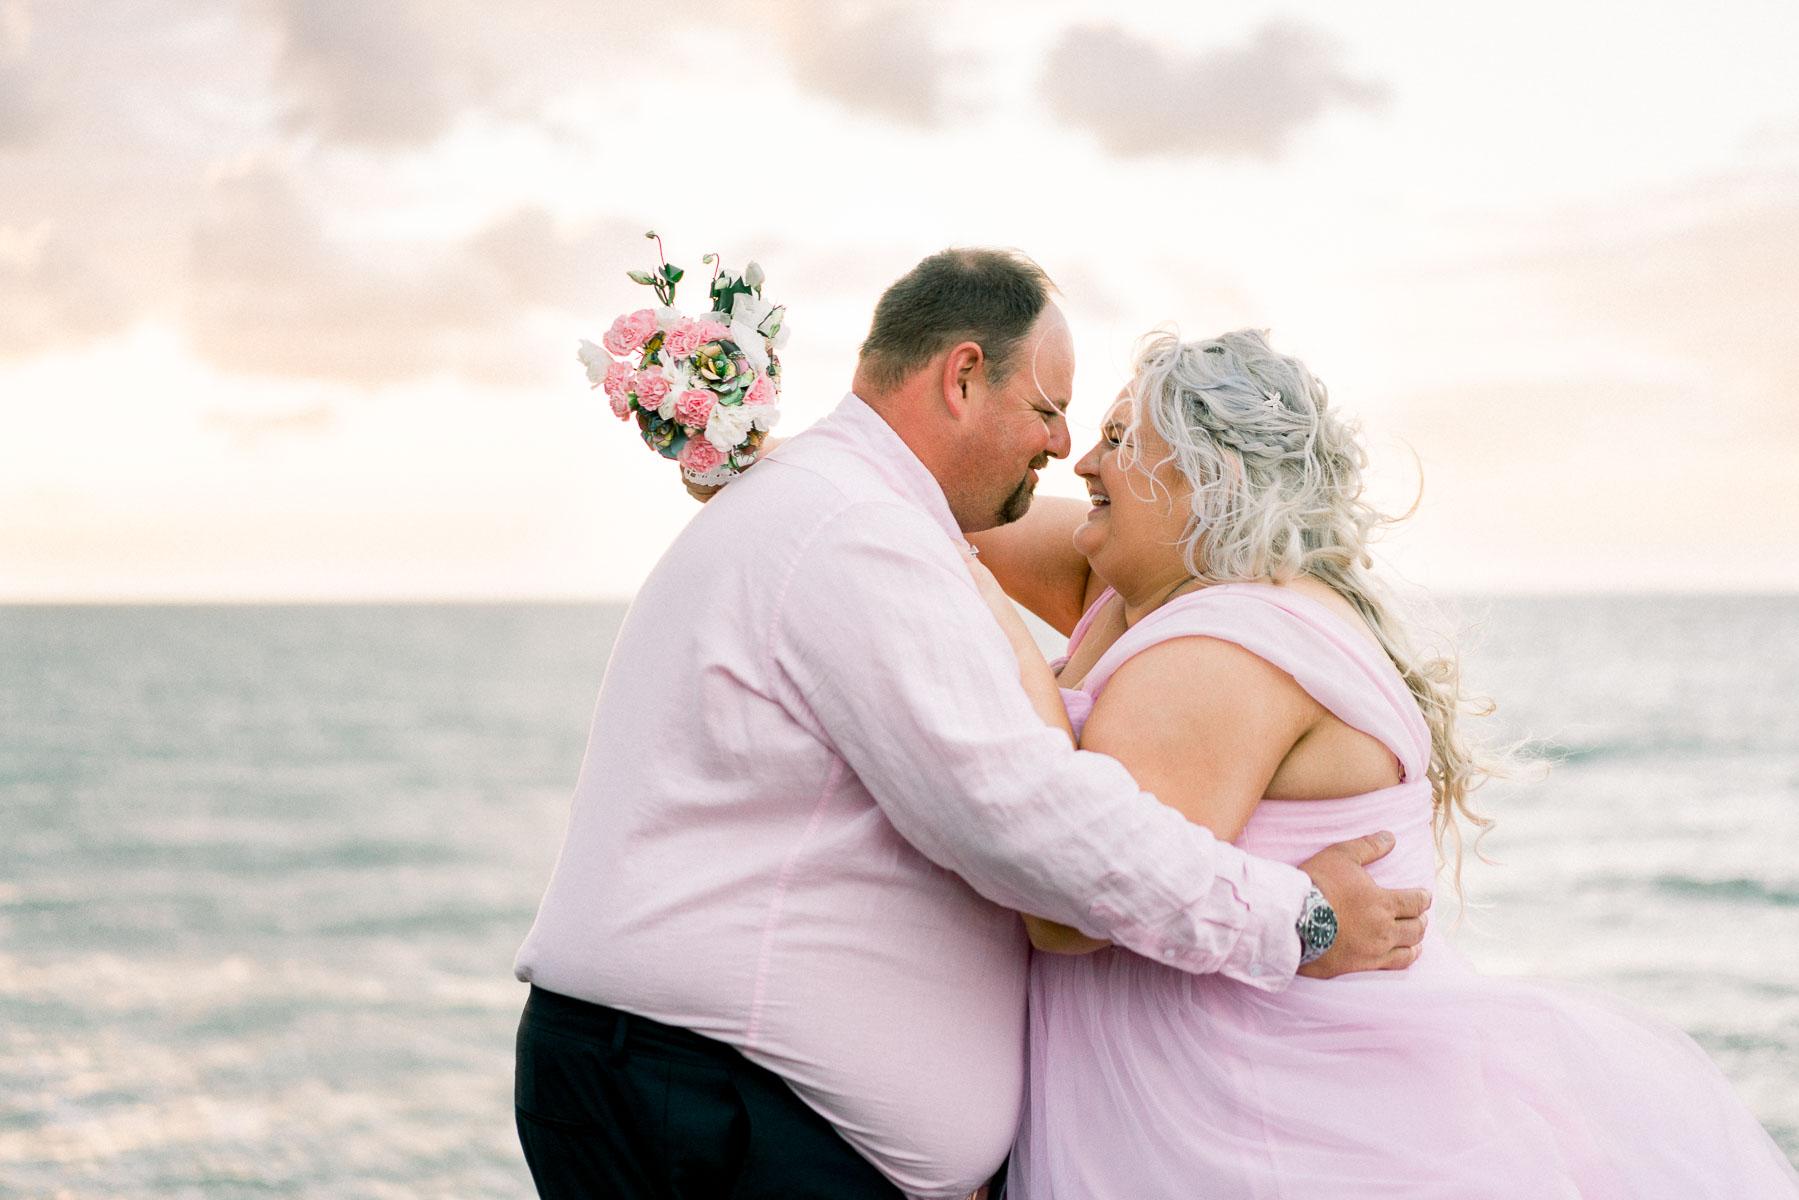 mt-eliza-mornington-peninsula-backyard-wedding-heart+soul-weddings-allison-matt-04107.jpg